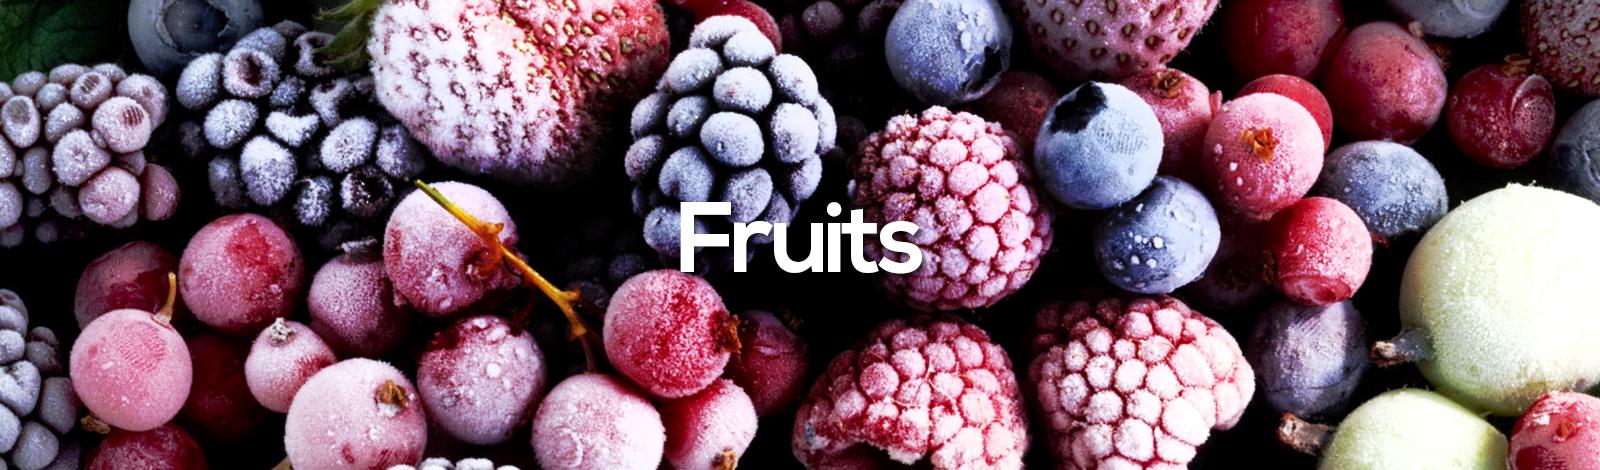 banner-produtos_fruits2